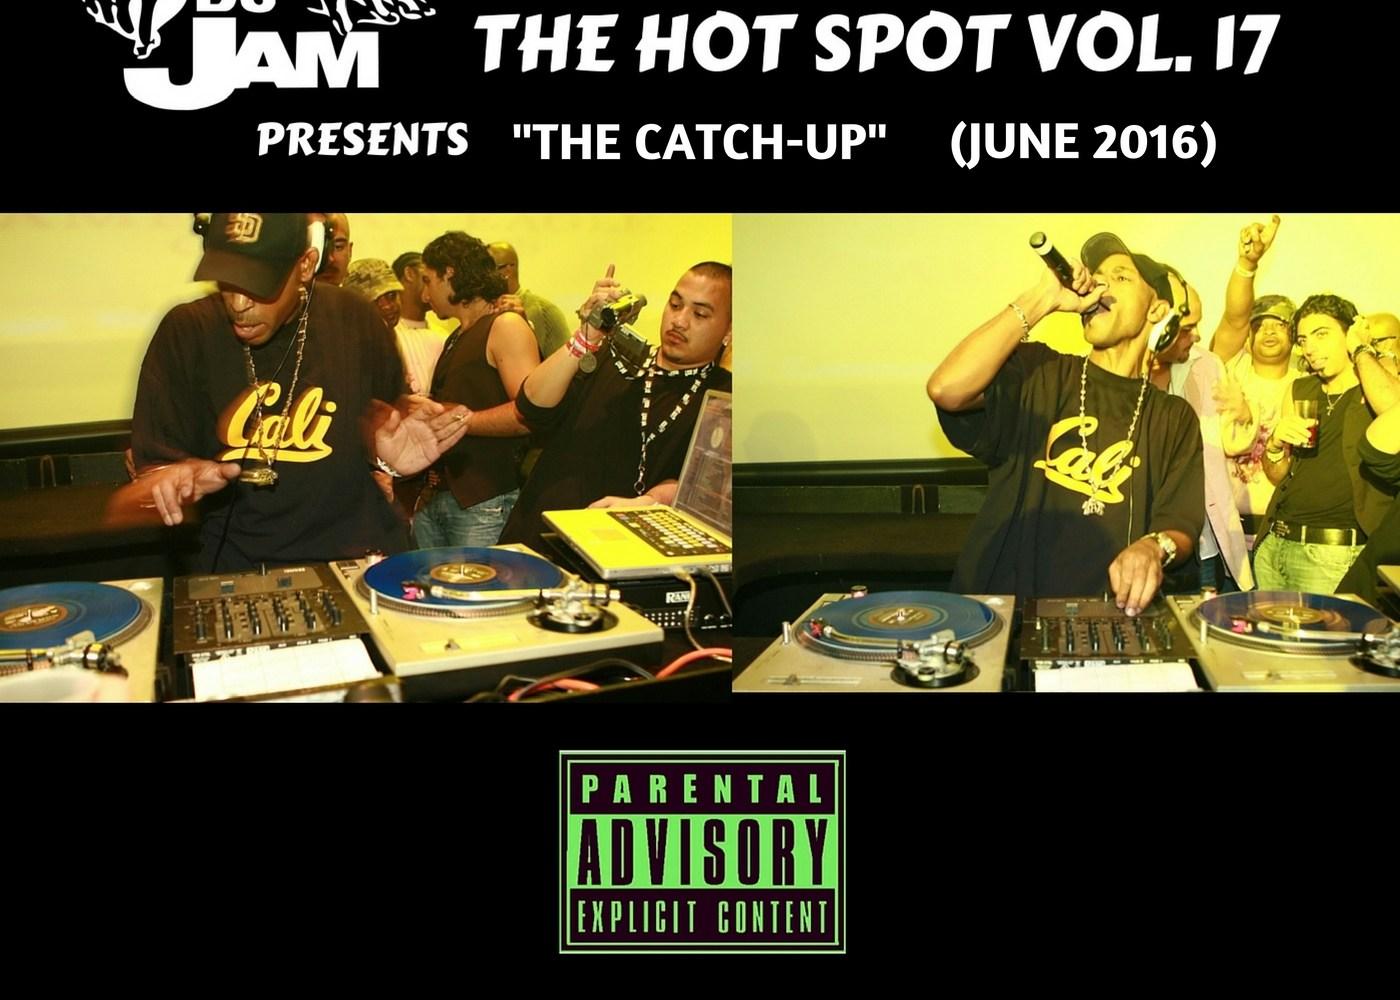 The Hot Spot Vol. 17 by DJ JAM